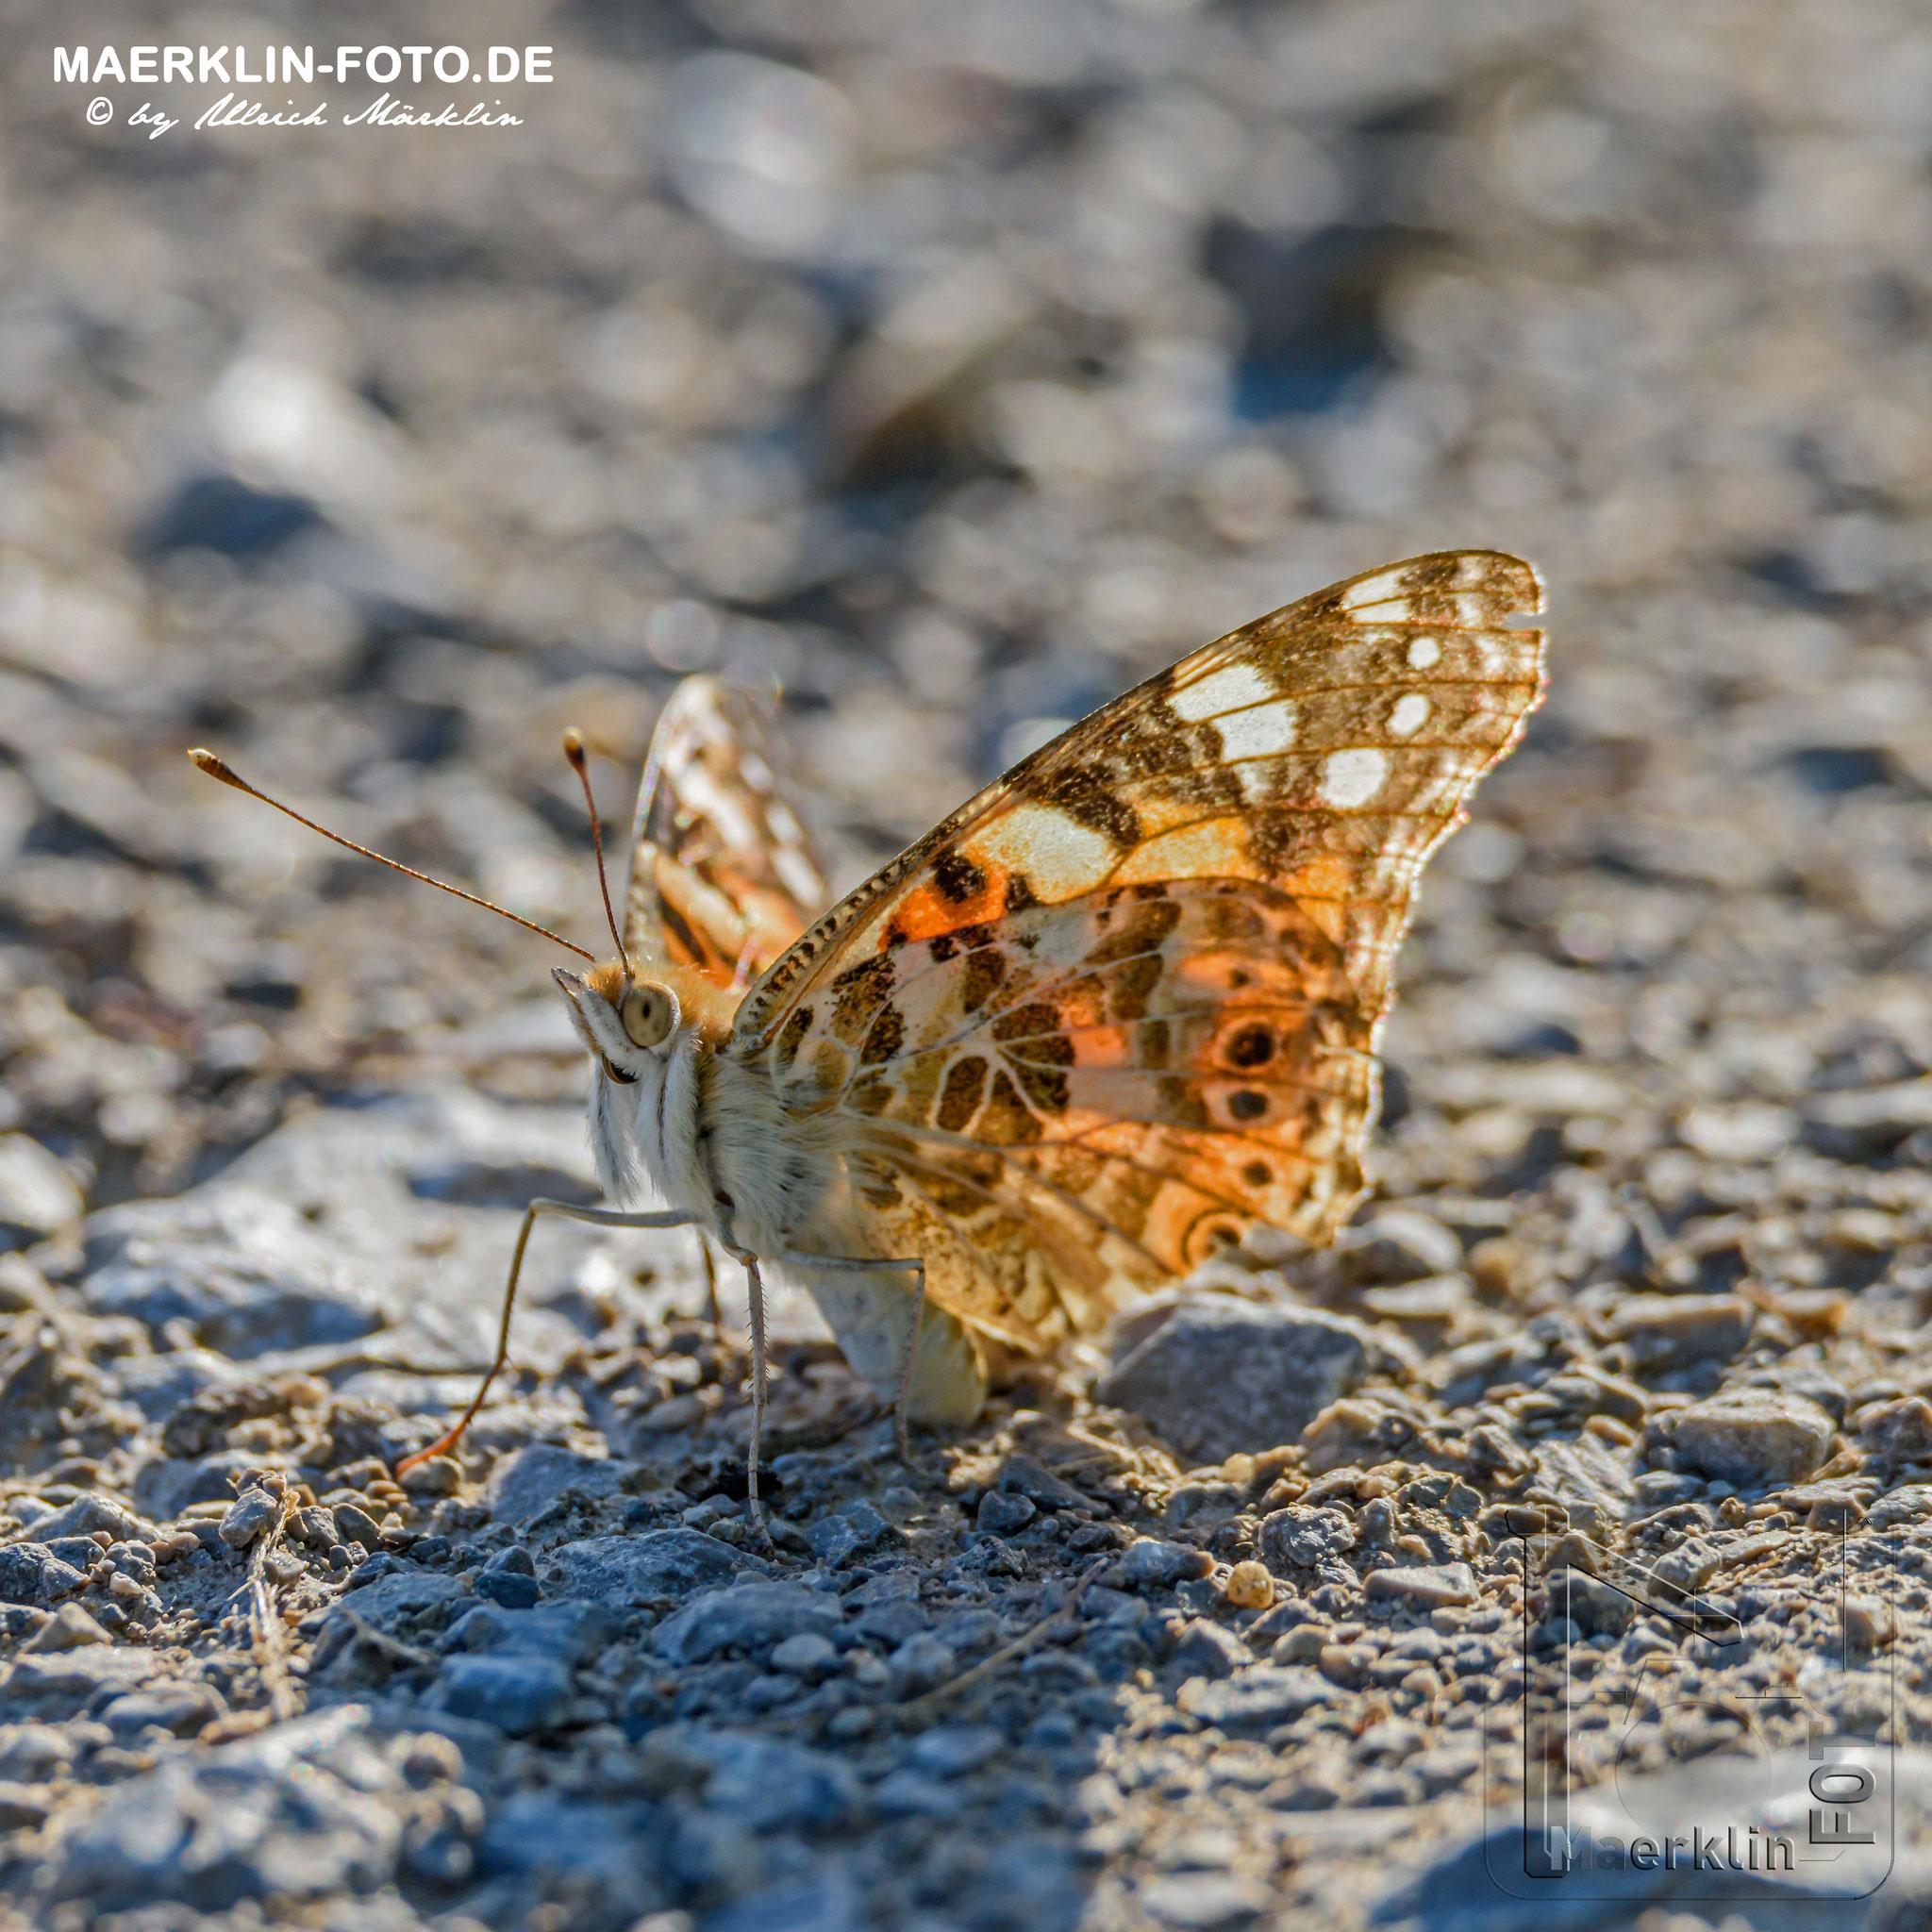 Distelfalter, Vanessa cardui, Schmetterling, Heckengäu